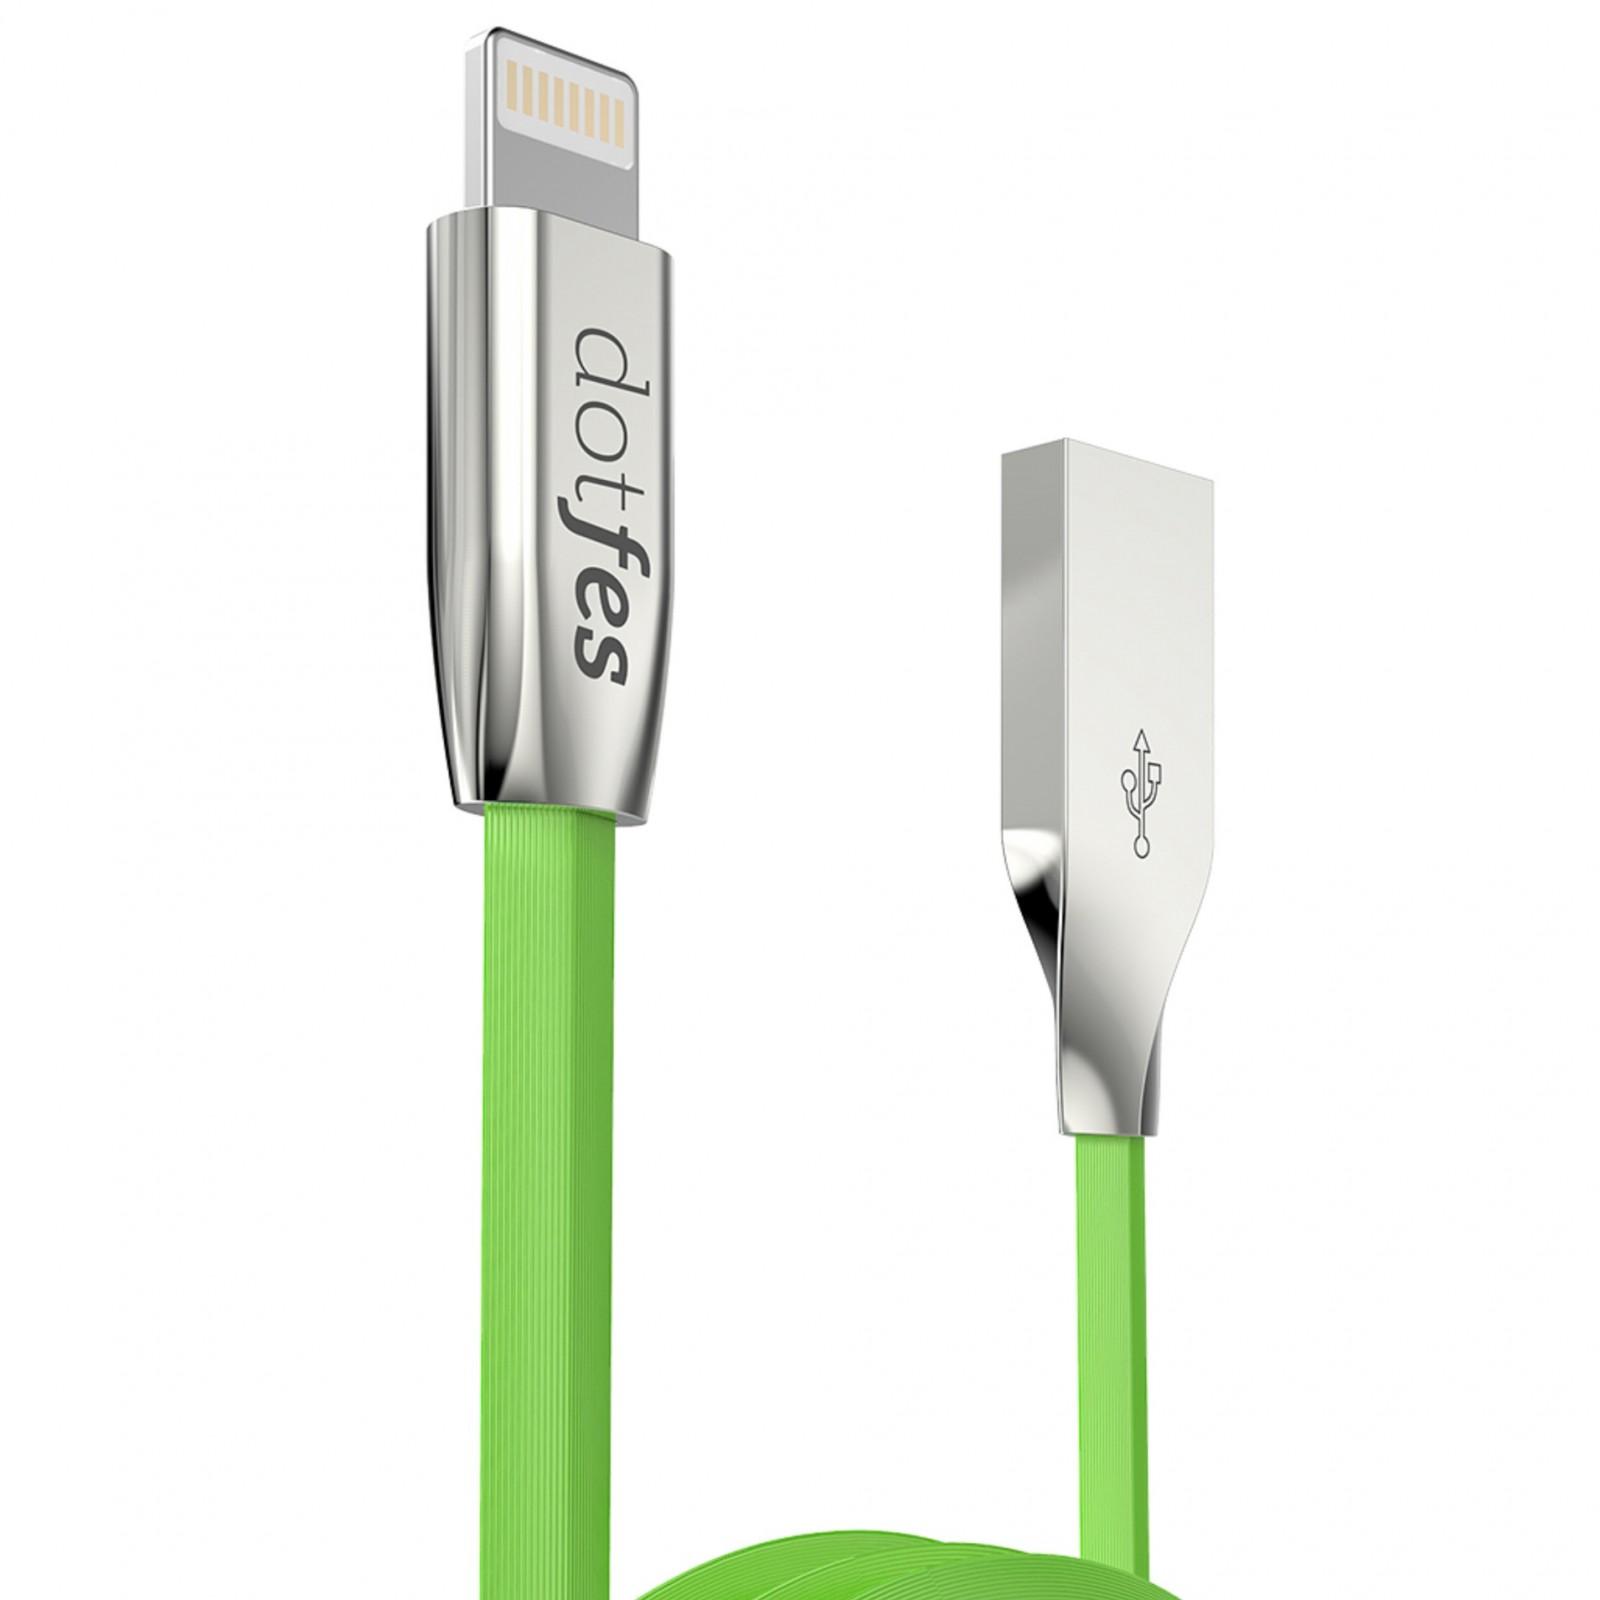 USB кабель Dotfes A04 Lightning (1m), green аксессуар dotfes usb lightning mfi a01f 2 5a 1m grey 14601